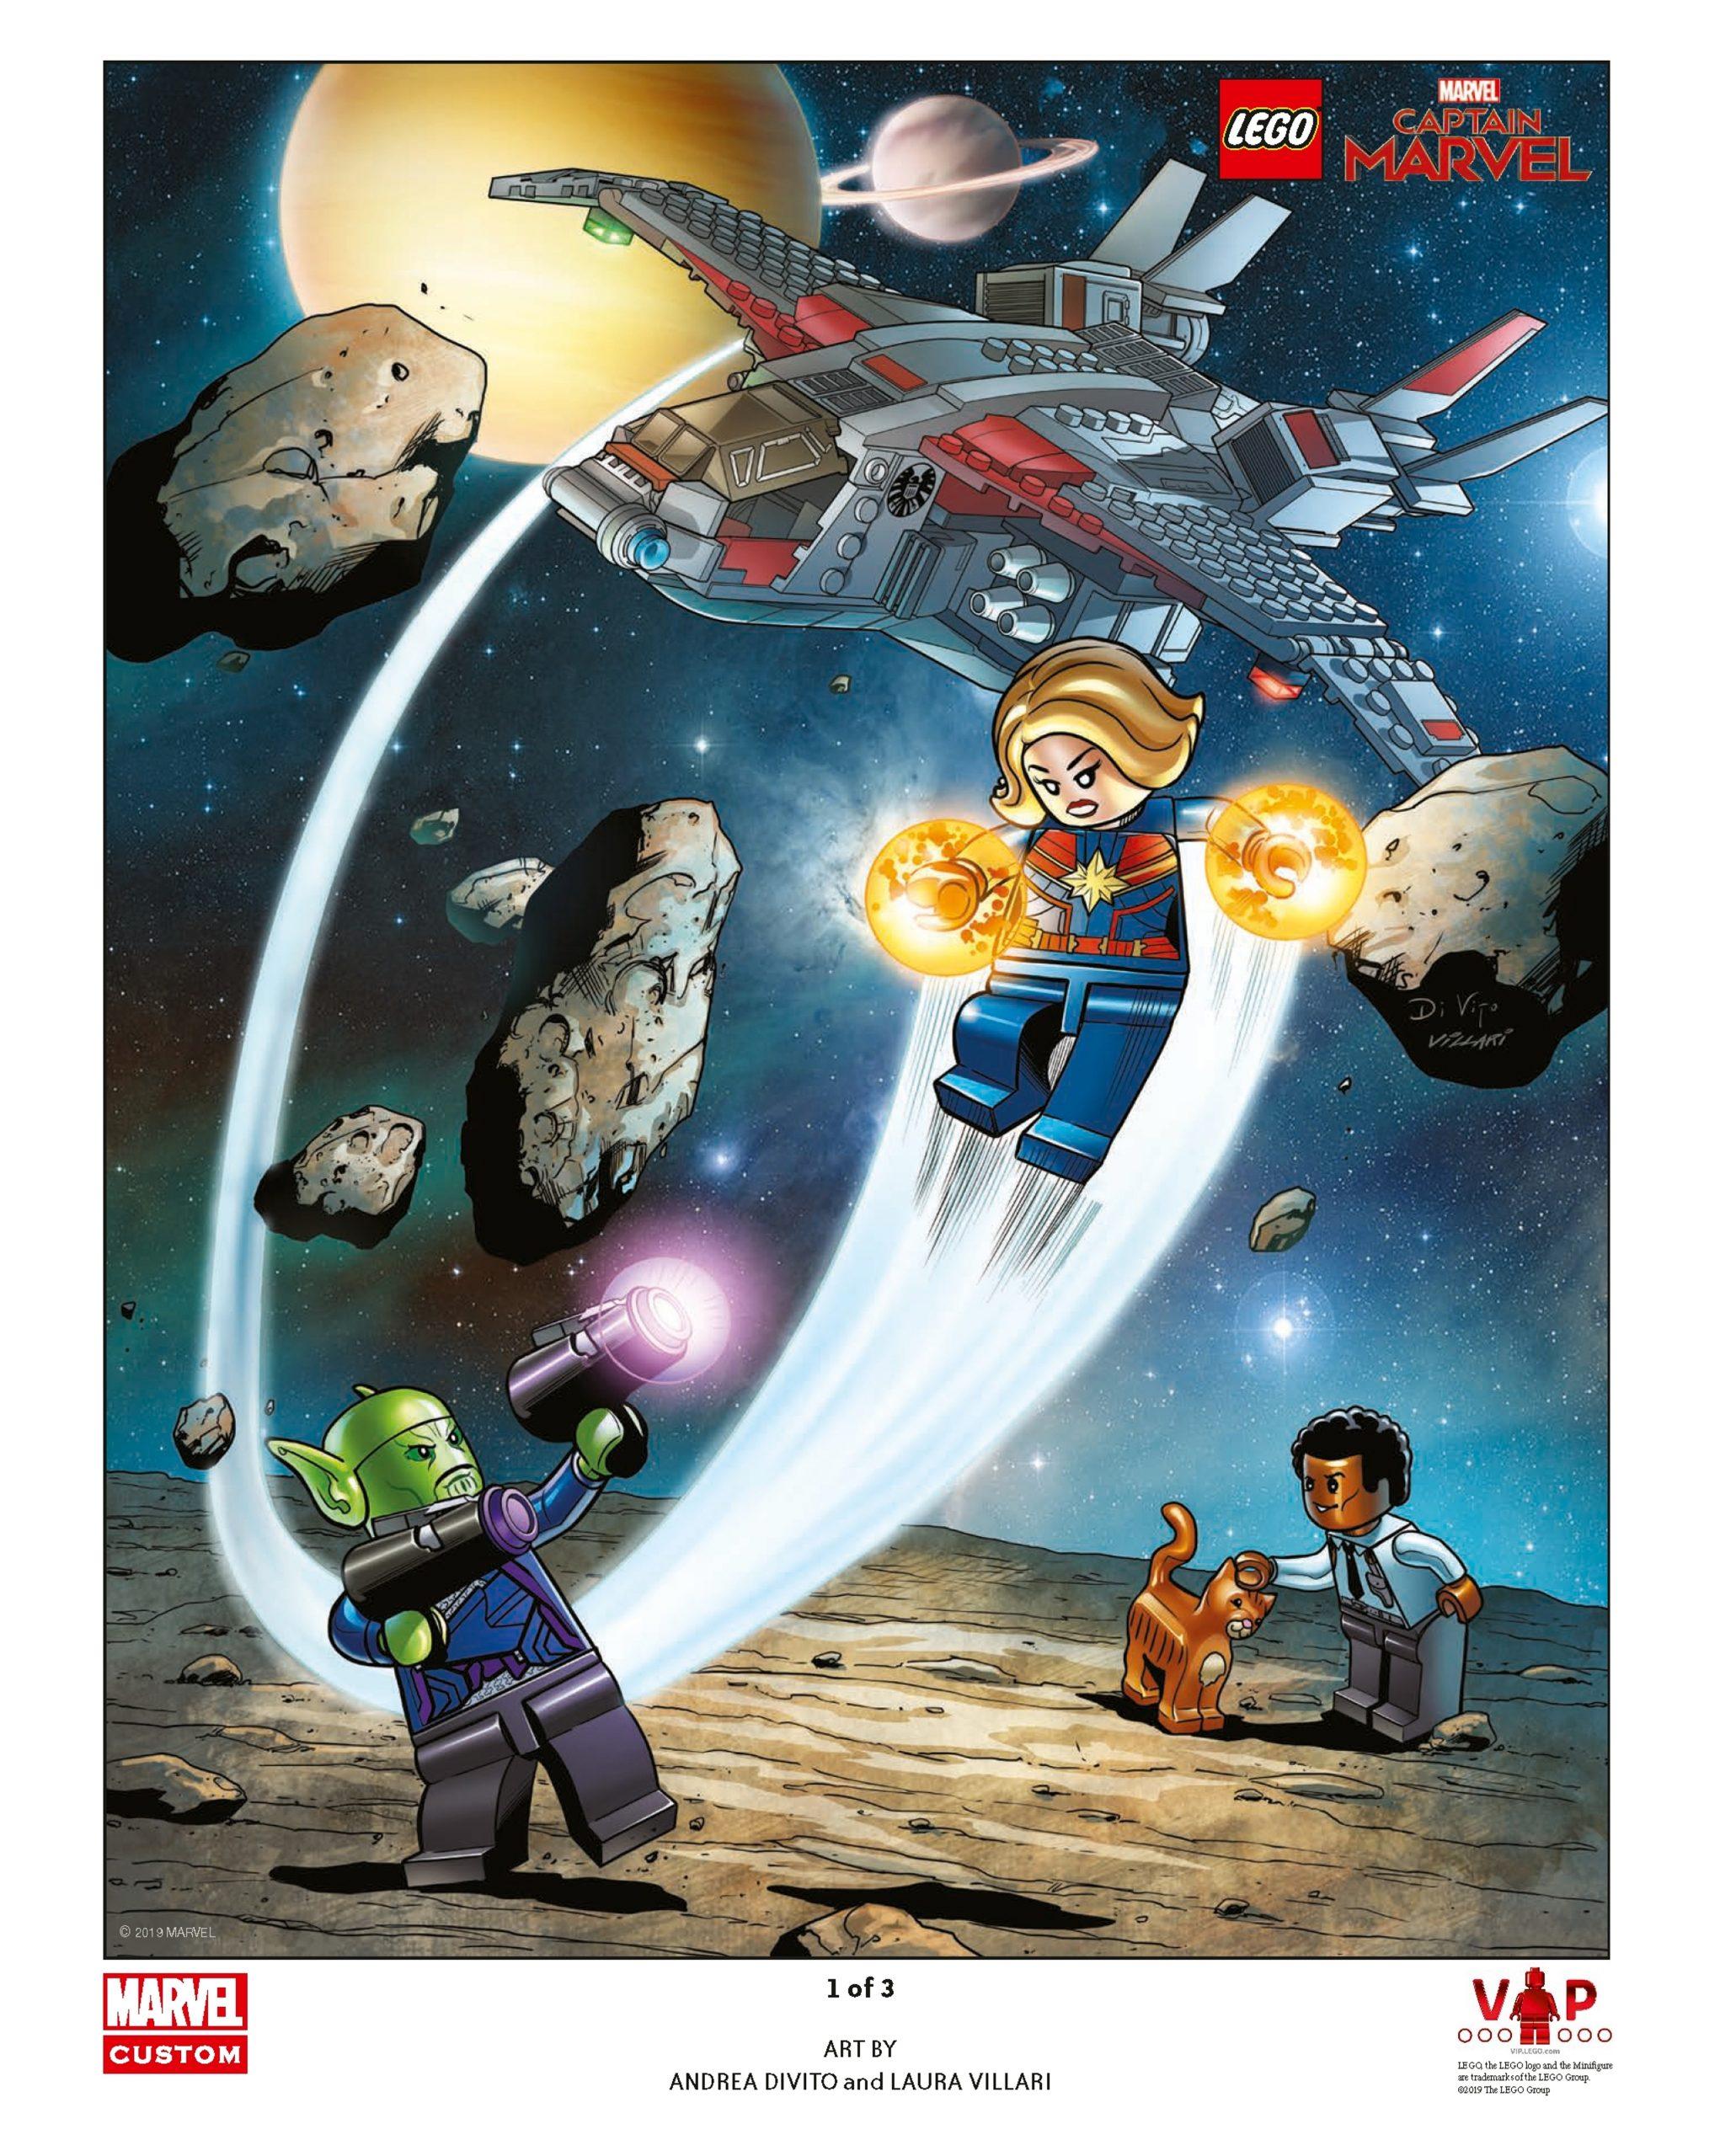 lego 5005877 captain marvel art print 1 of 3 scaled